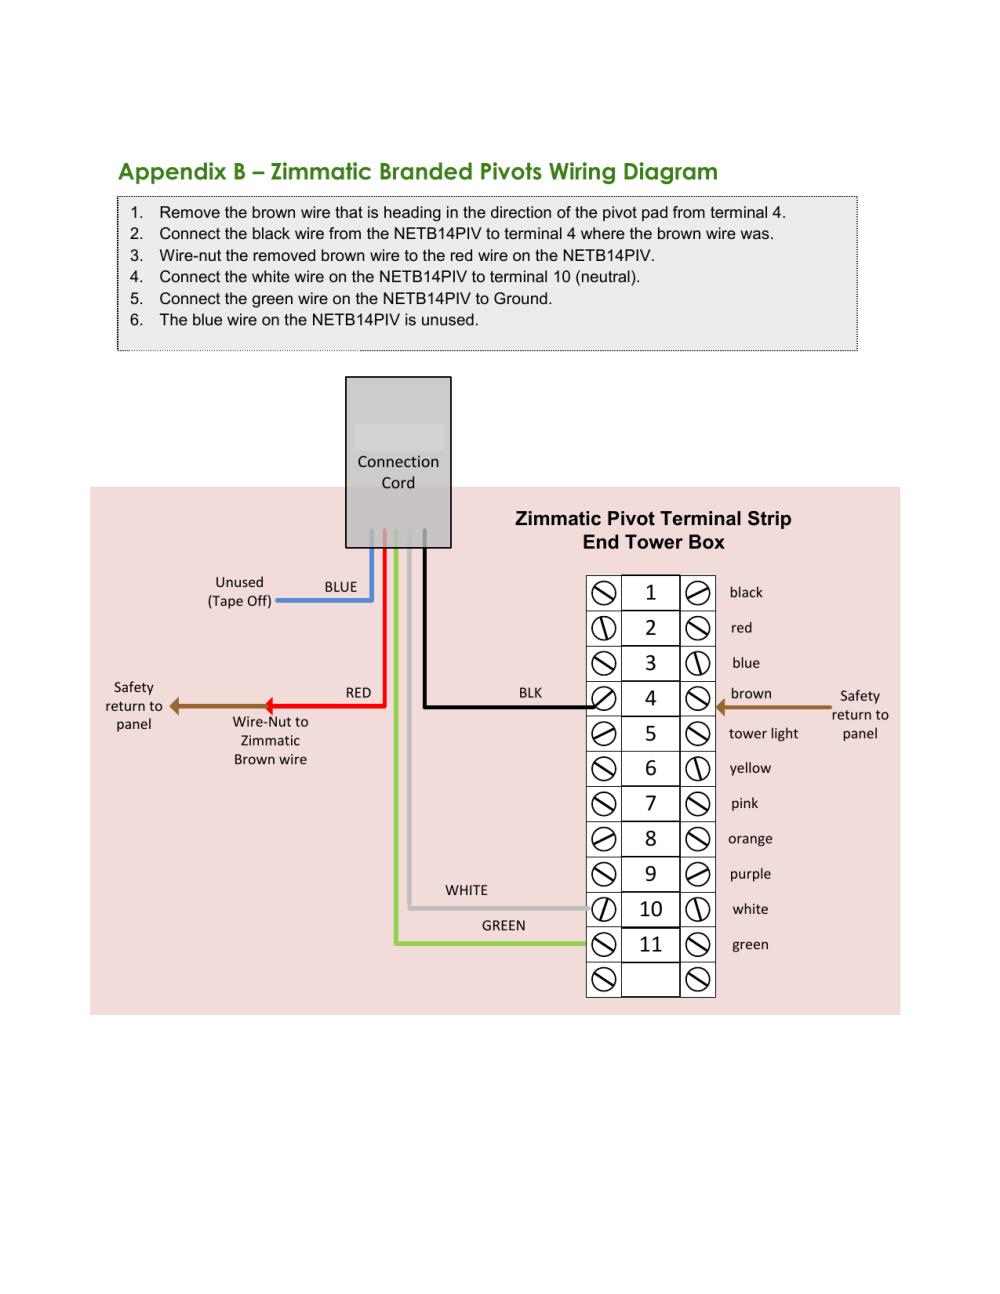 medium resolution of appendix b zimmatic branded pivots wiring diagram manualzz com zimmatic wiring diagram zimmatic wiring diagram